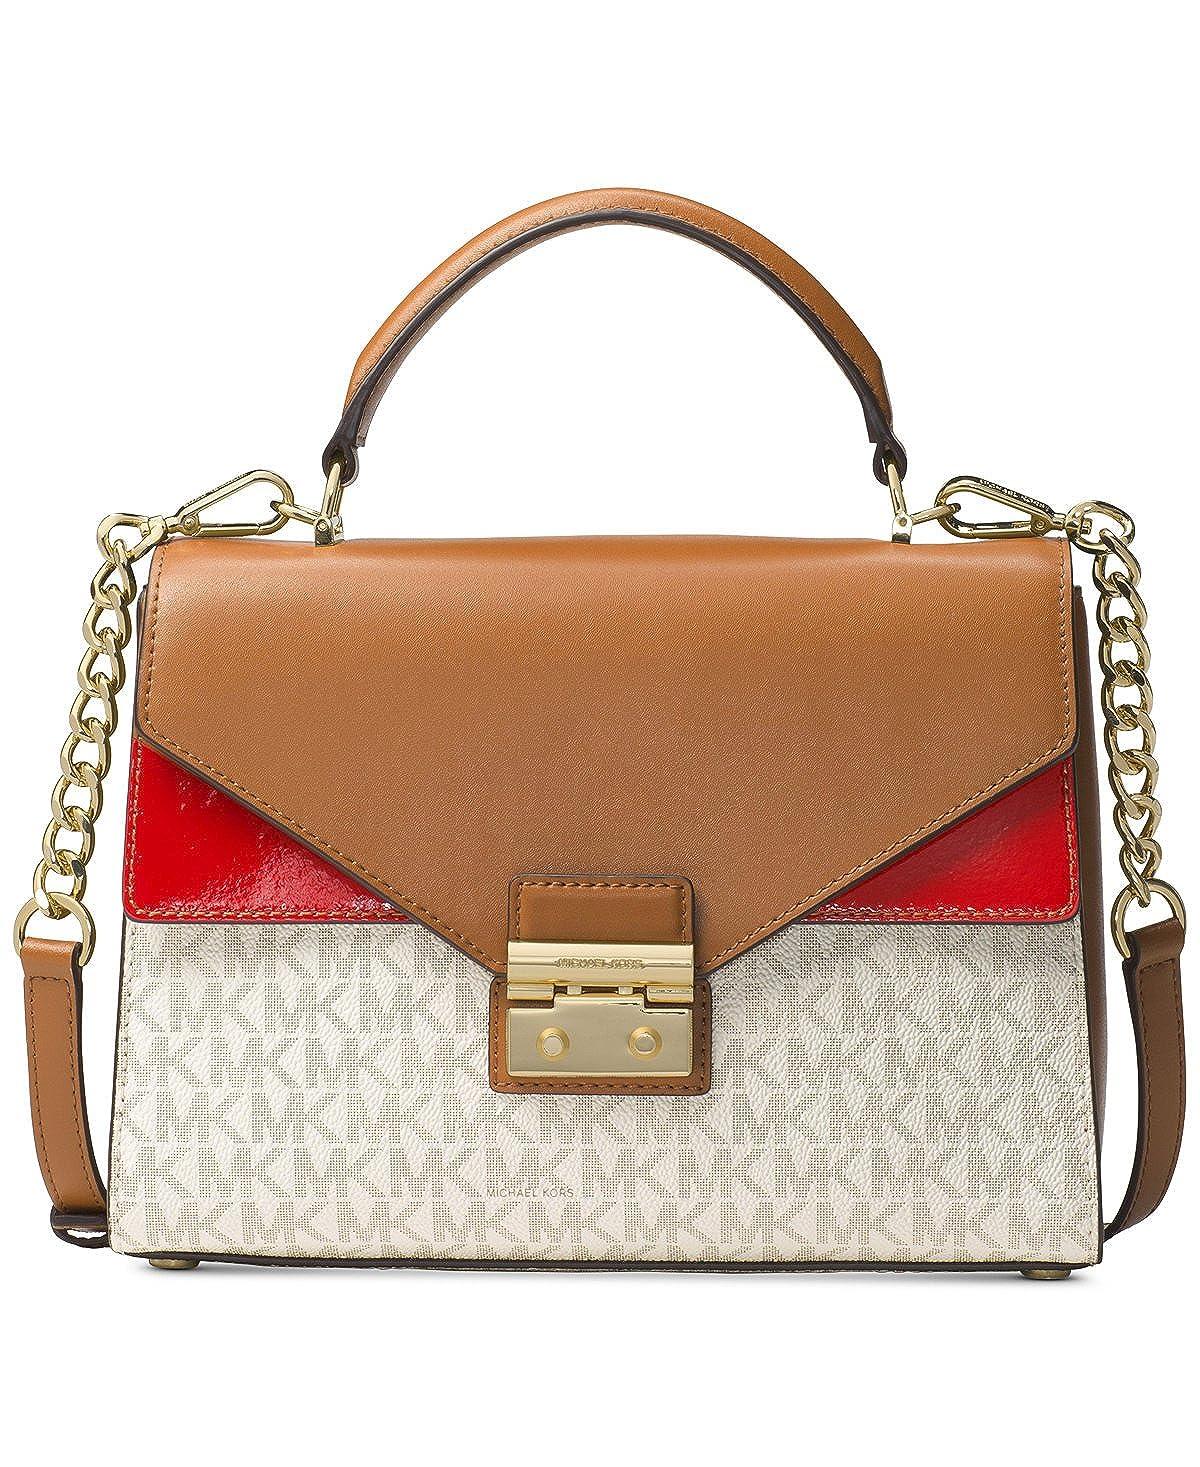 45abb34e1fd3 Amazon.com: MICHAEL Michael Kors Sloan Medium Top-Handle Logo Leather  Satchel, Vanilla Acorn Bright Red: Shoes